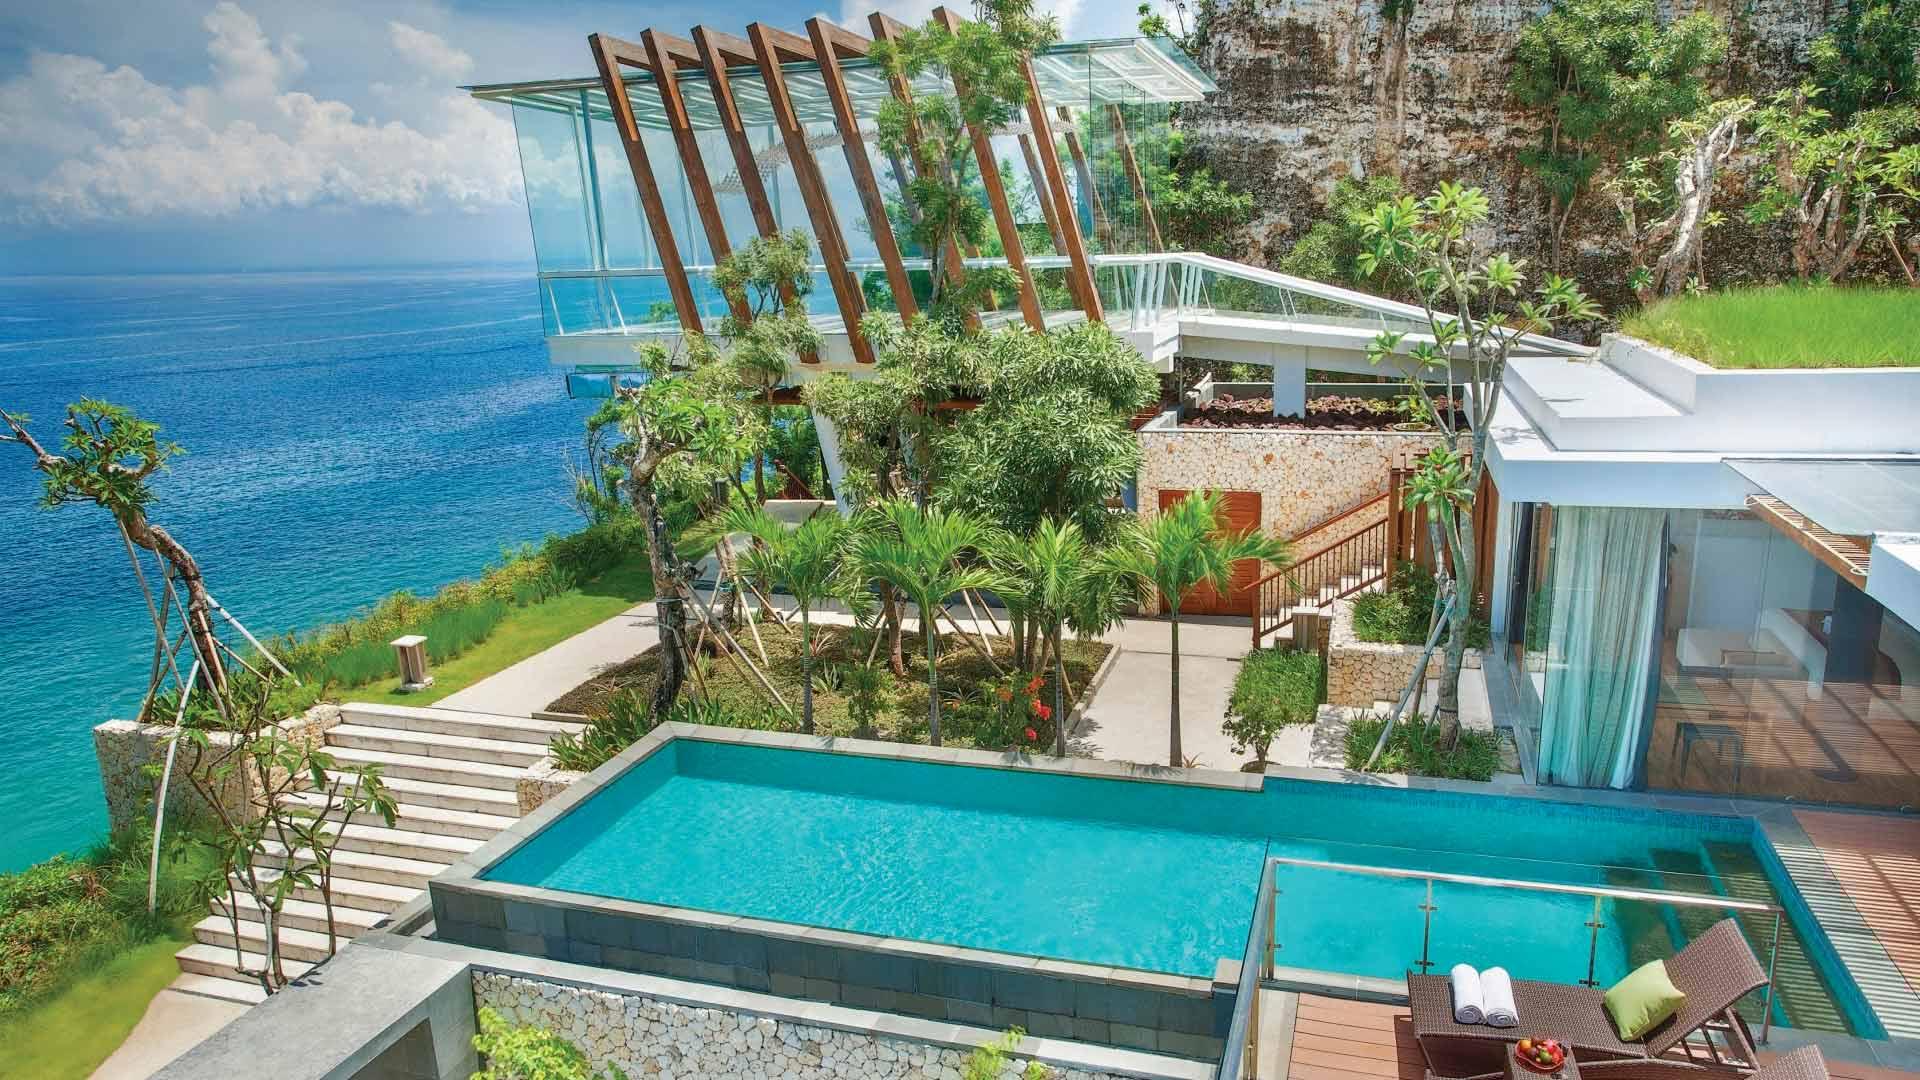 Bali Resorts | Anantara Uluwatu Bali Resort Official Site